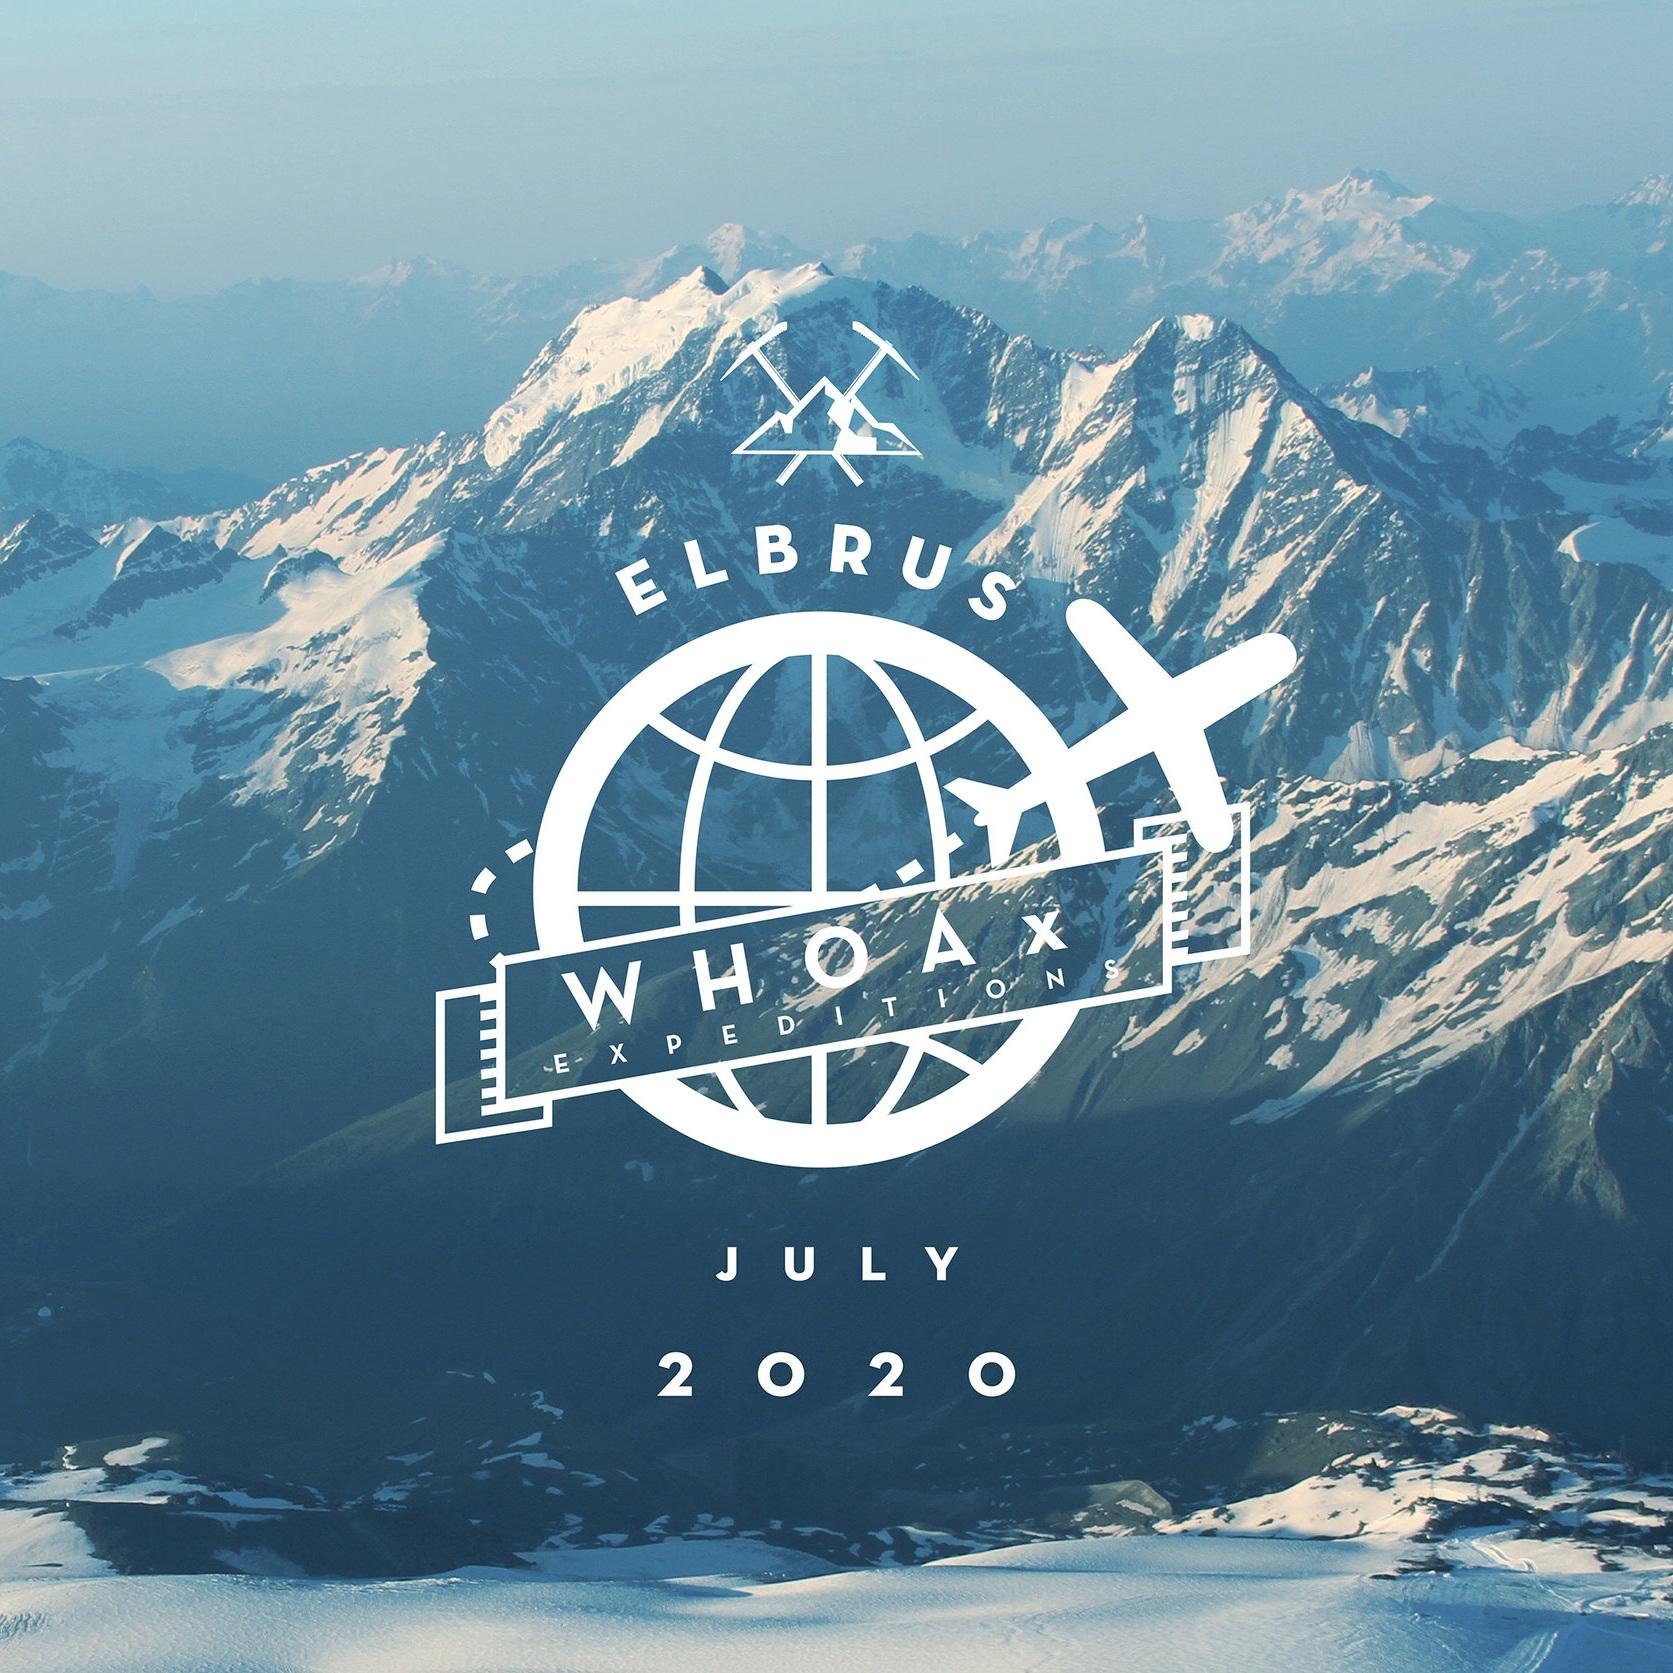 JULY 19 - 27 - 2020WHOAx: MOUNT ELBRUS$2,800